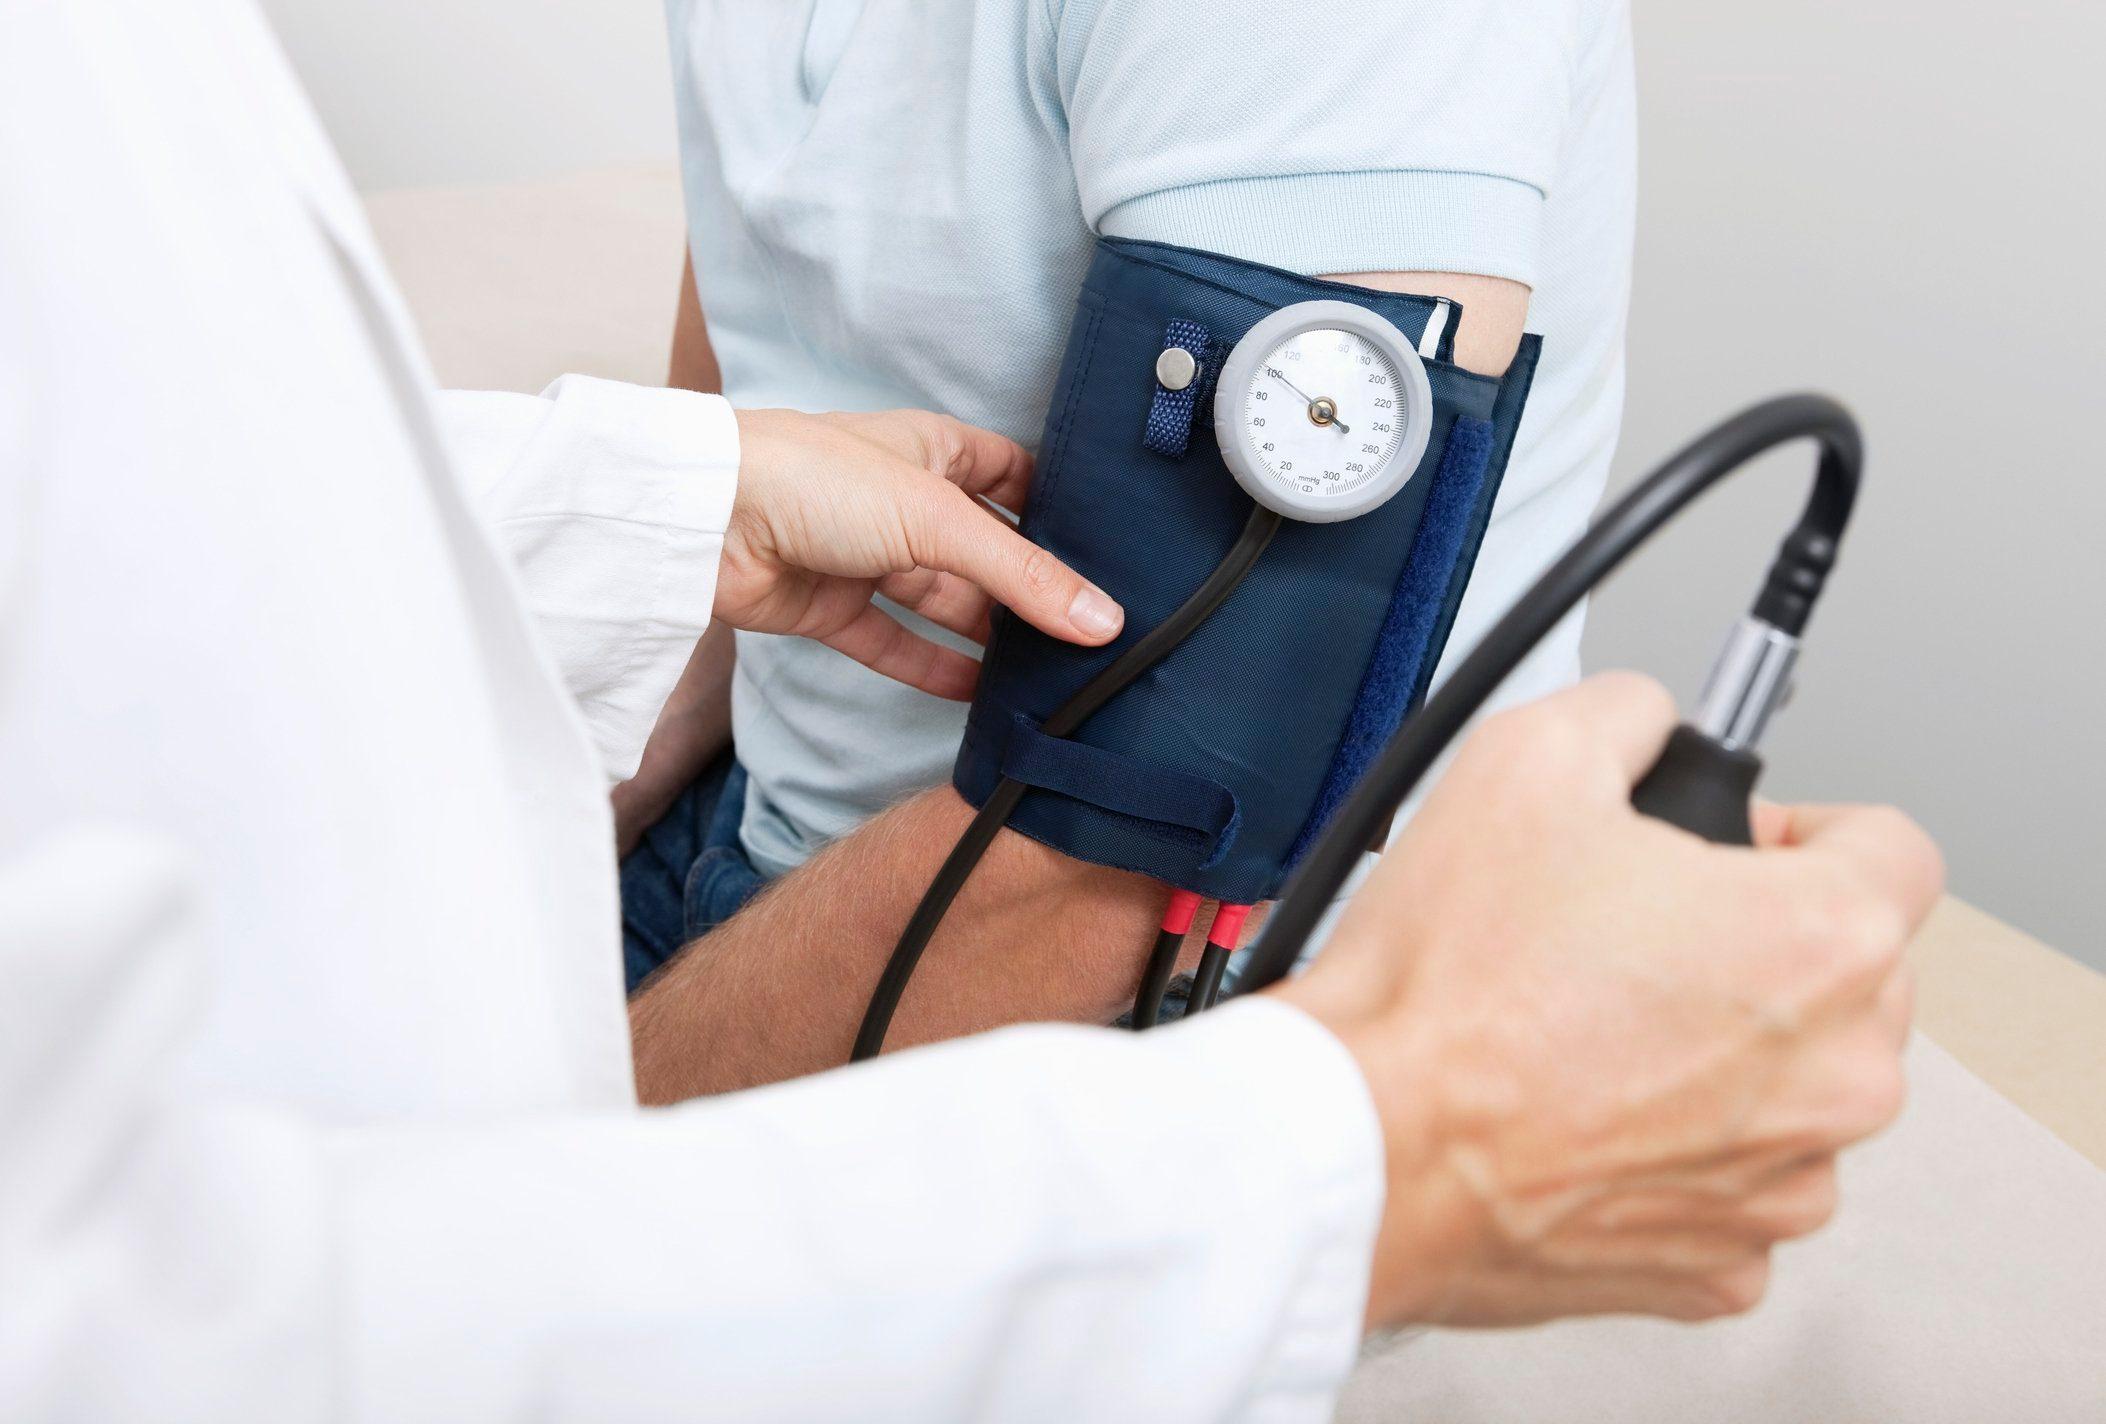 measuring blood pressure close up